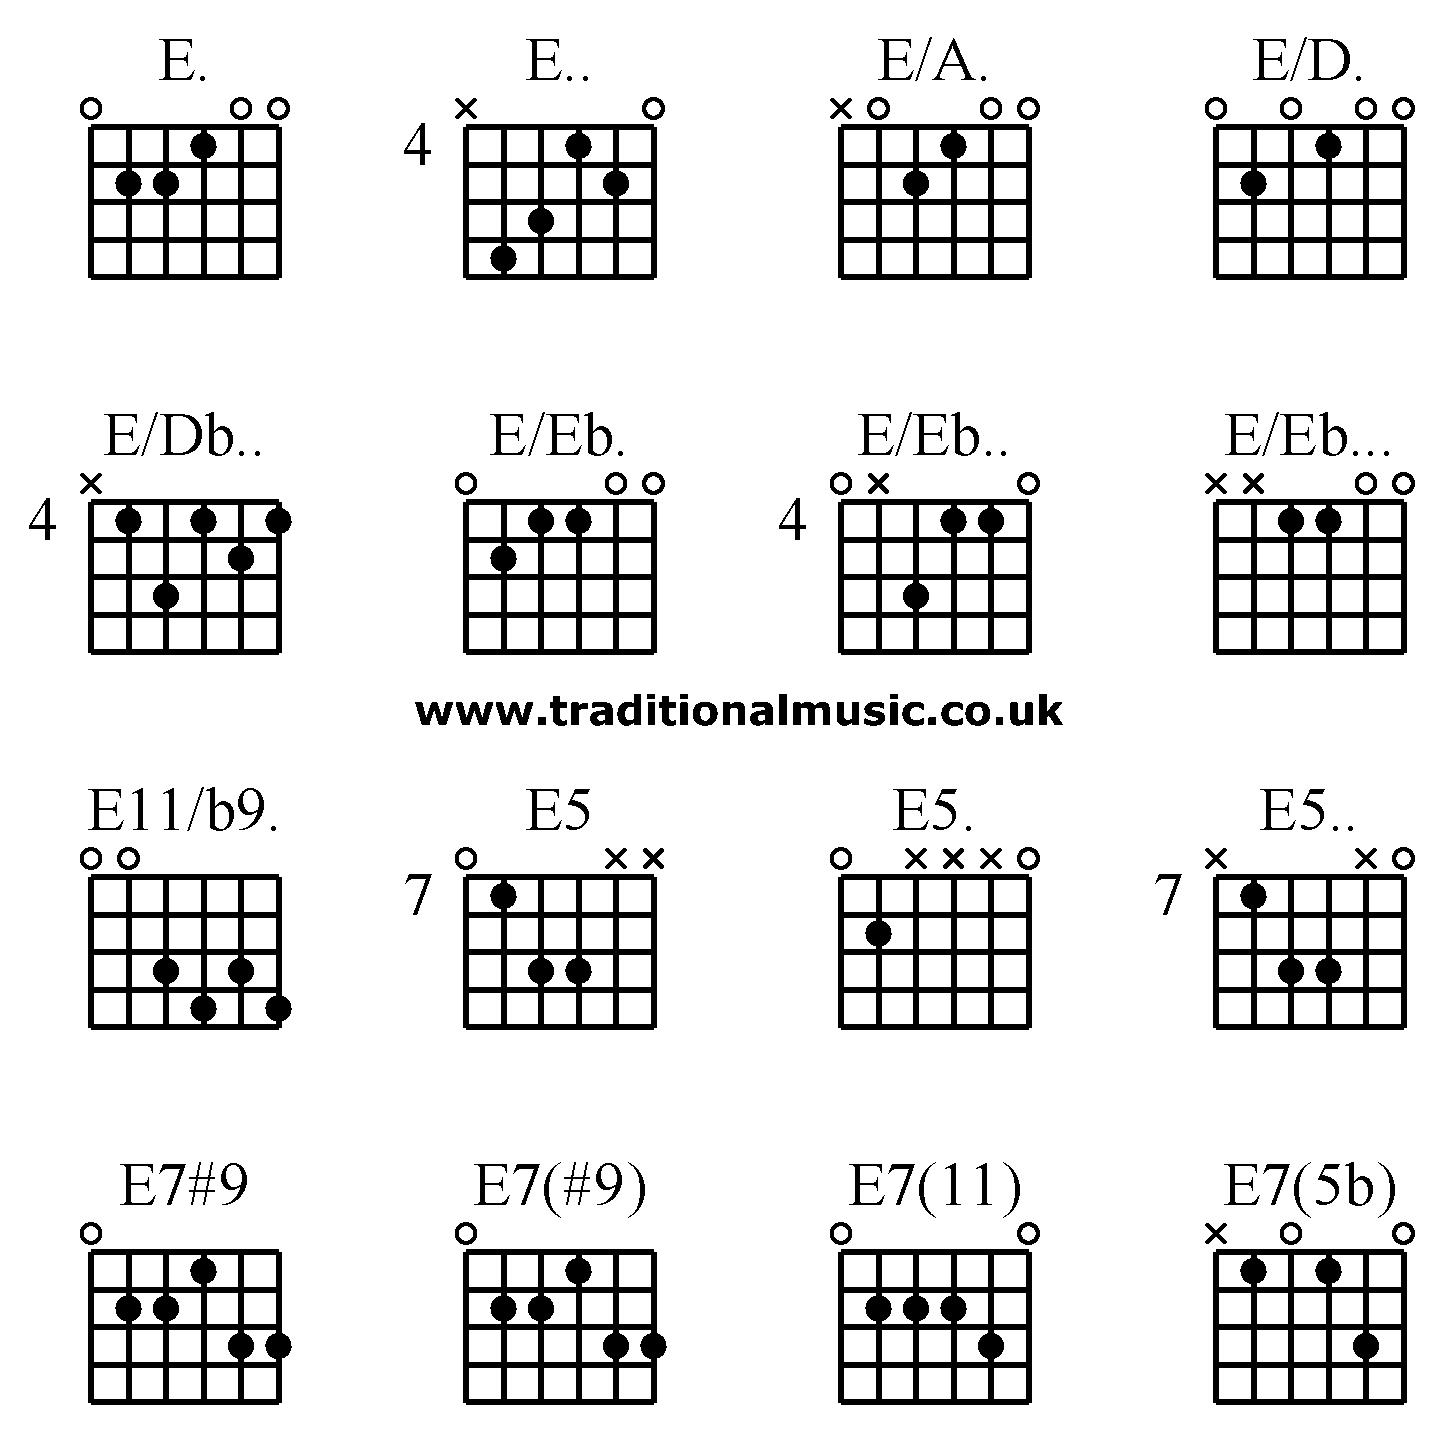 Advanced Guitar Chords E E E A E D E Db E Eb E Eb